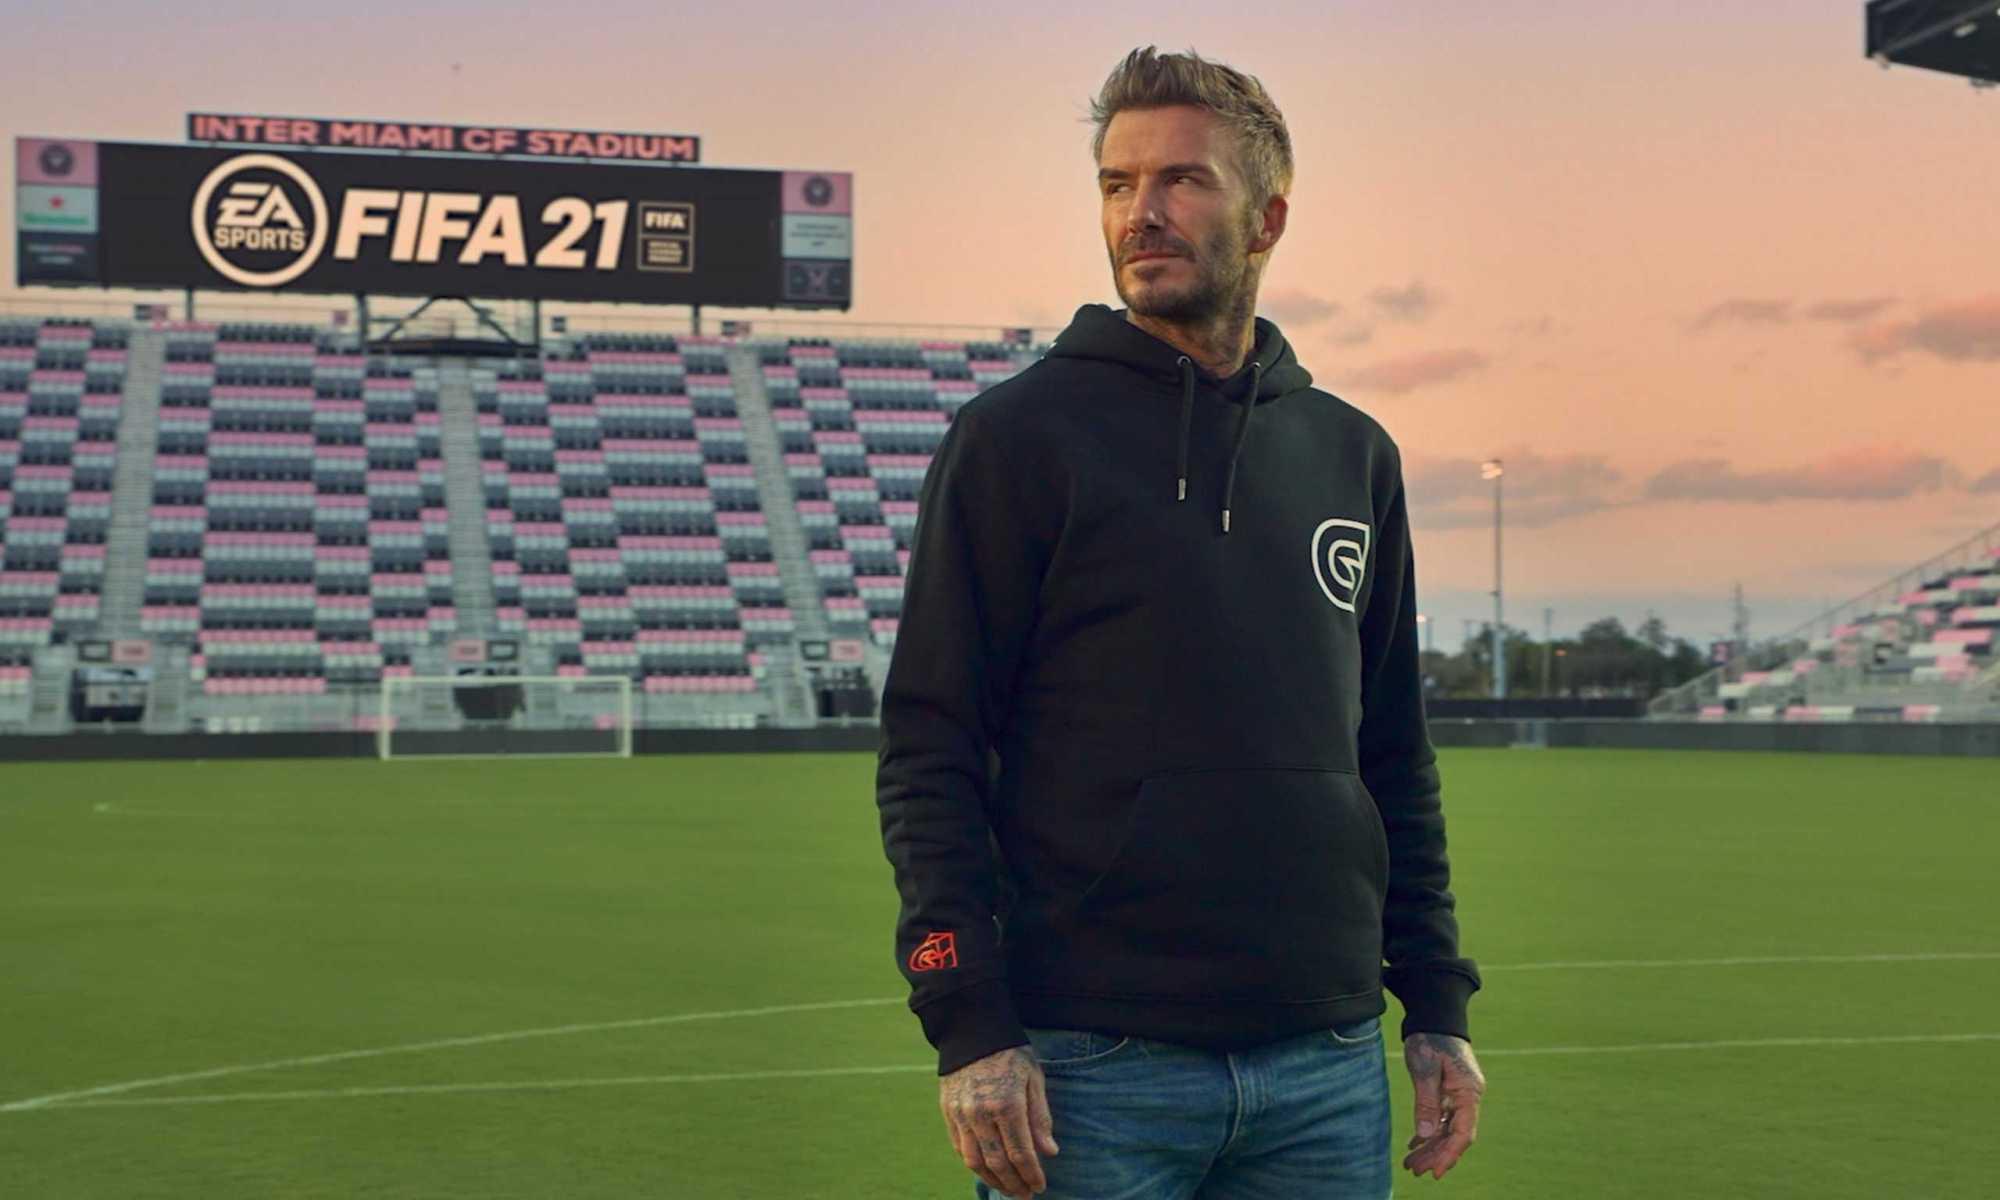 DB FIFA scaled